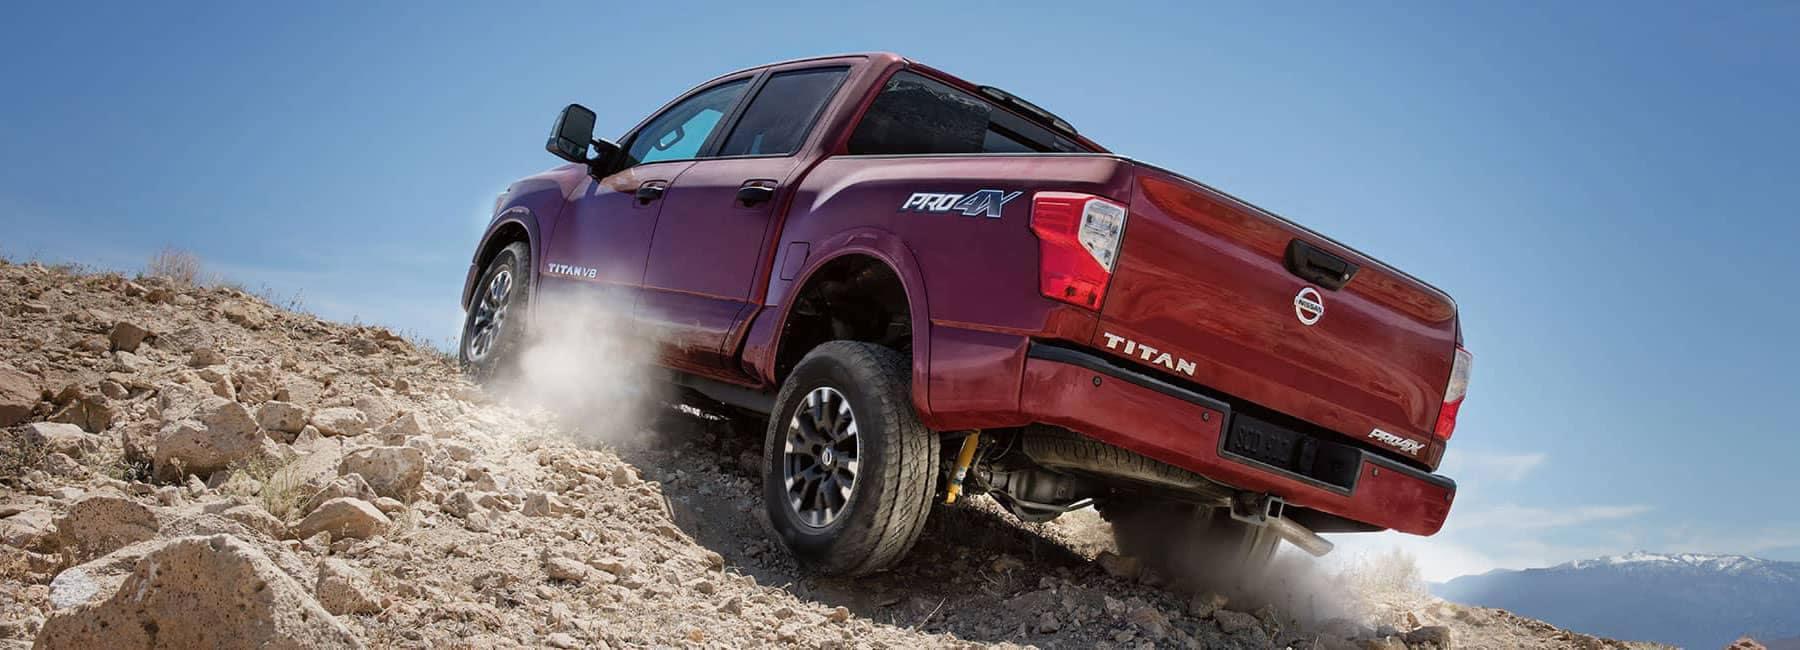 2019 Nissan Titan driving up sand hill